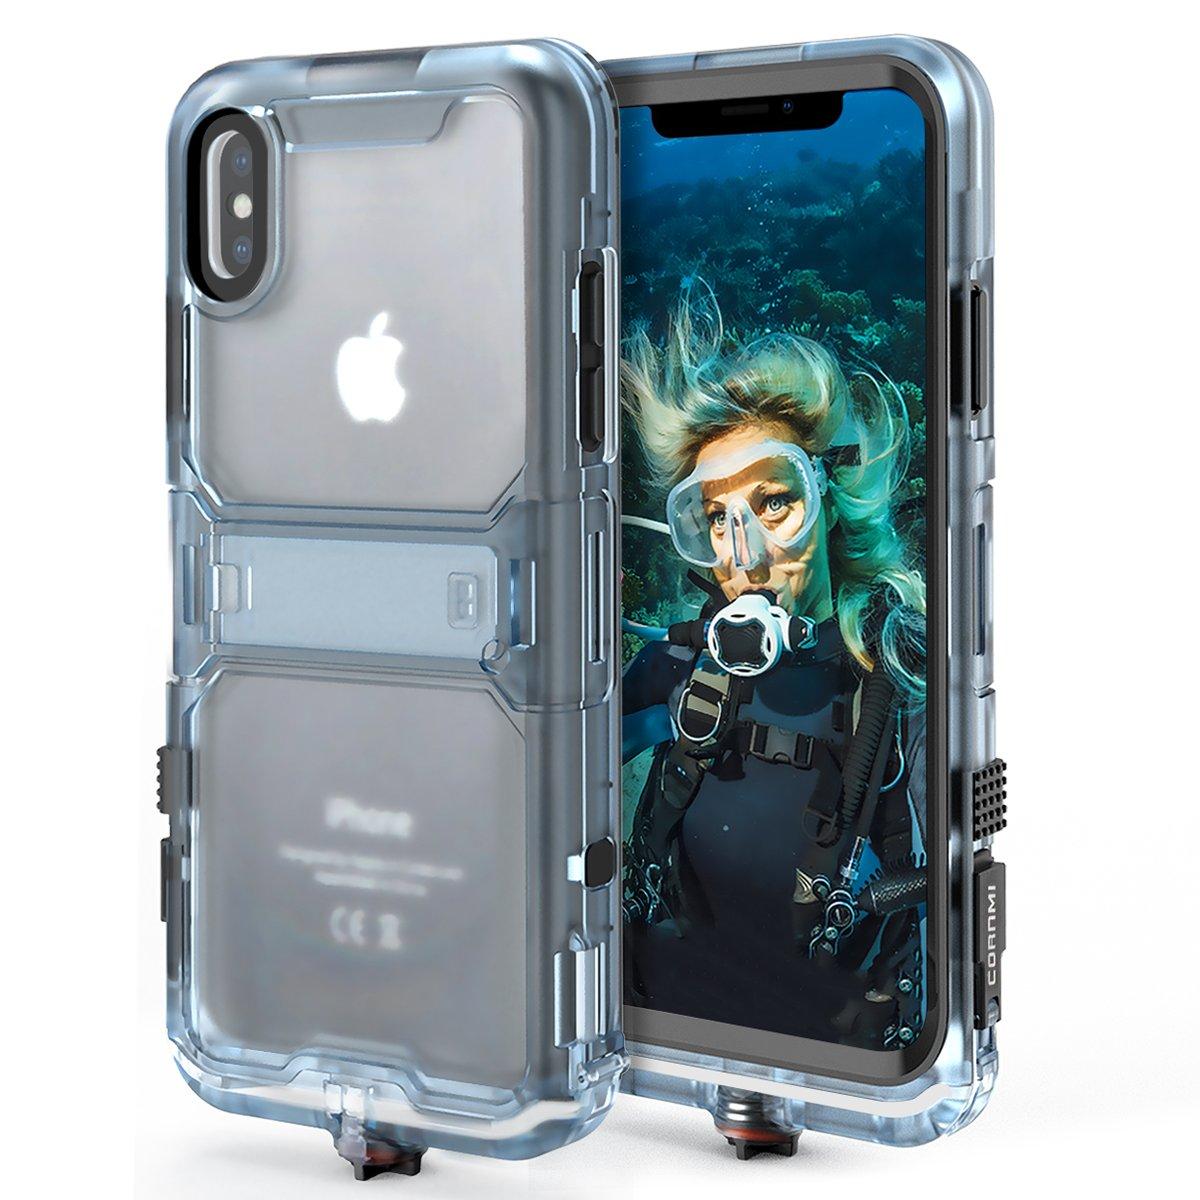 Cornmi iPhone X Waterproof Case, Full Sealed IP68 Certified Waterproof Shockproof Snowproof Protection Underwater Case for iPhone X 5.2inch (Black) by Cornmi (Image #2)